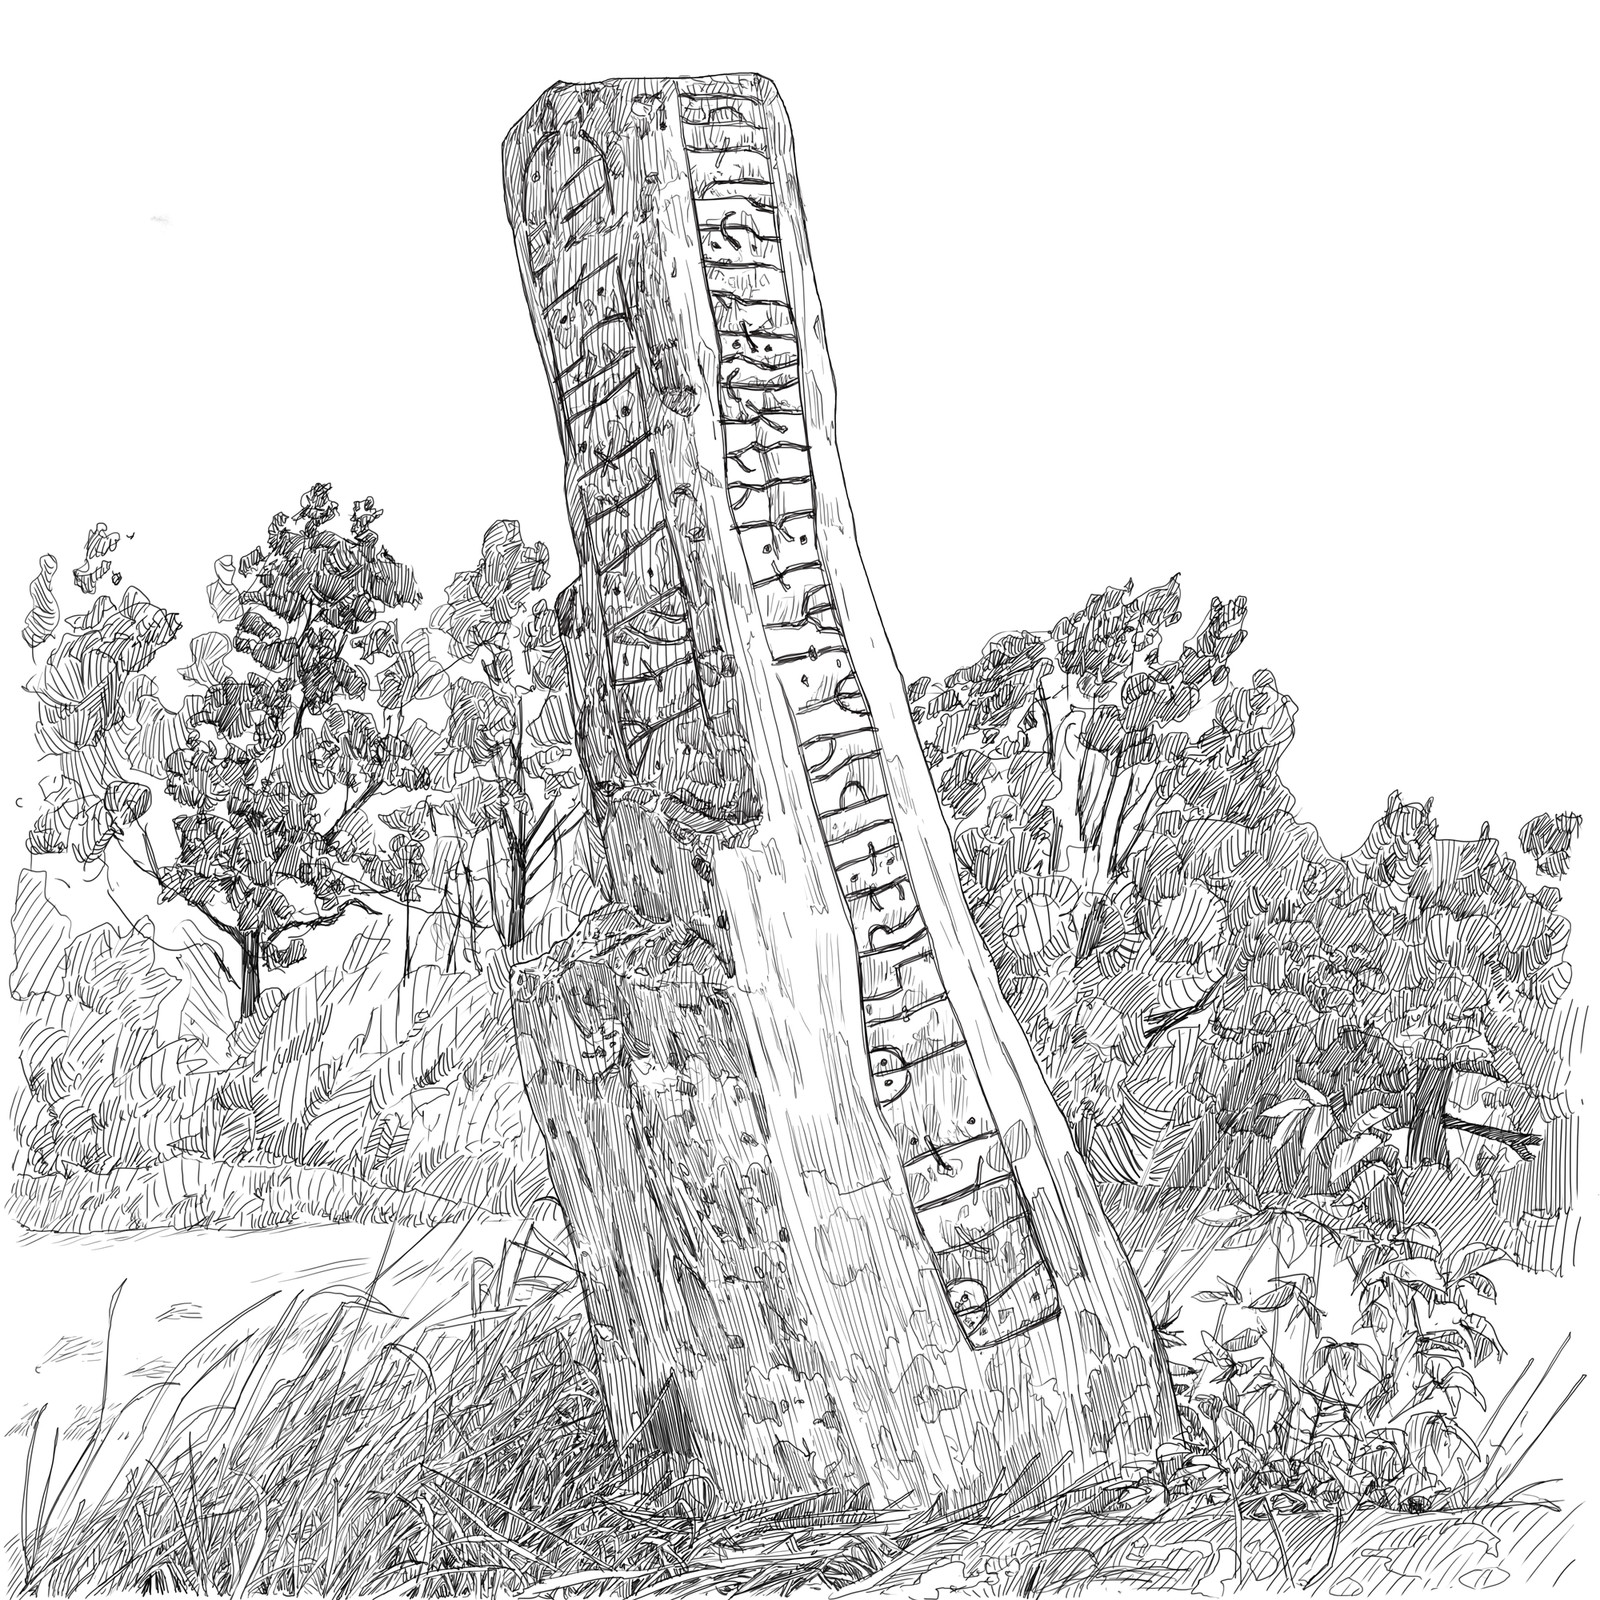 Transjö Runestone